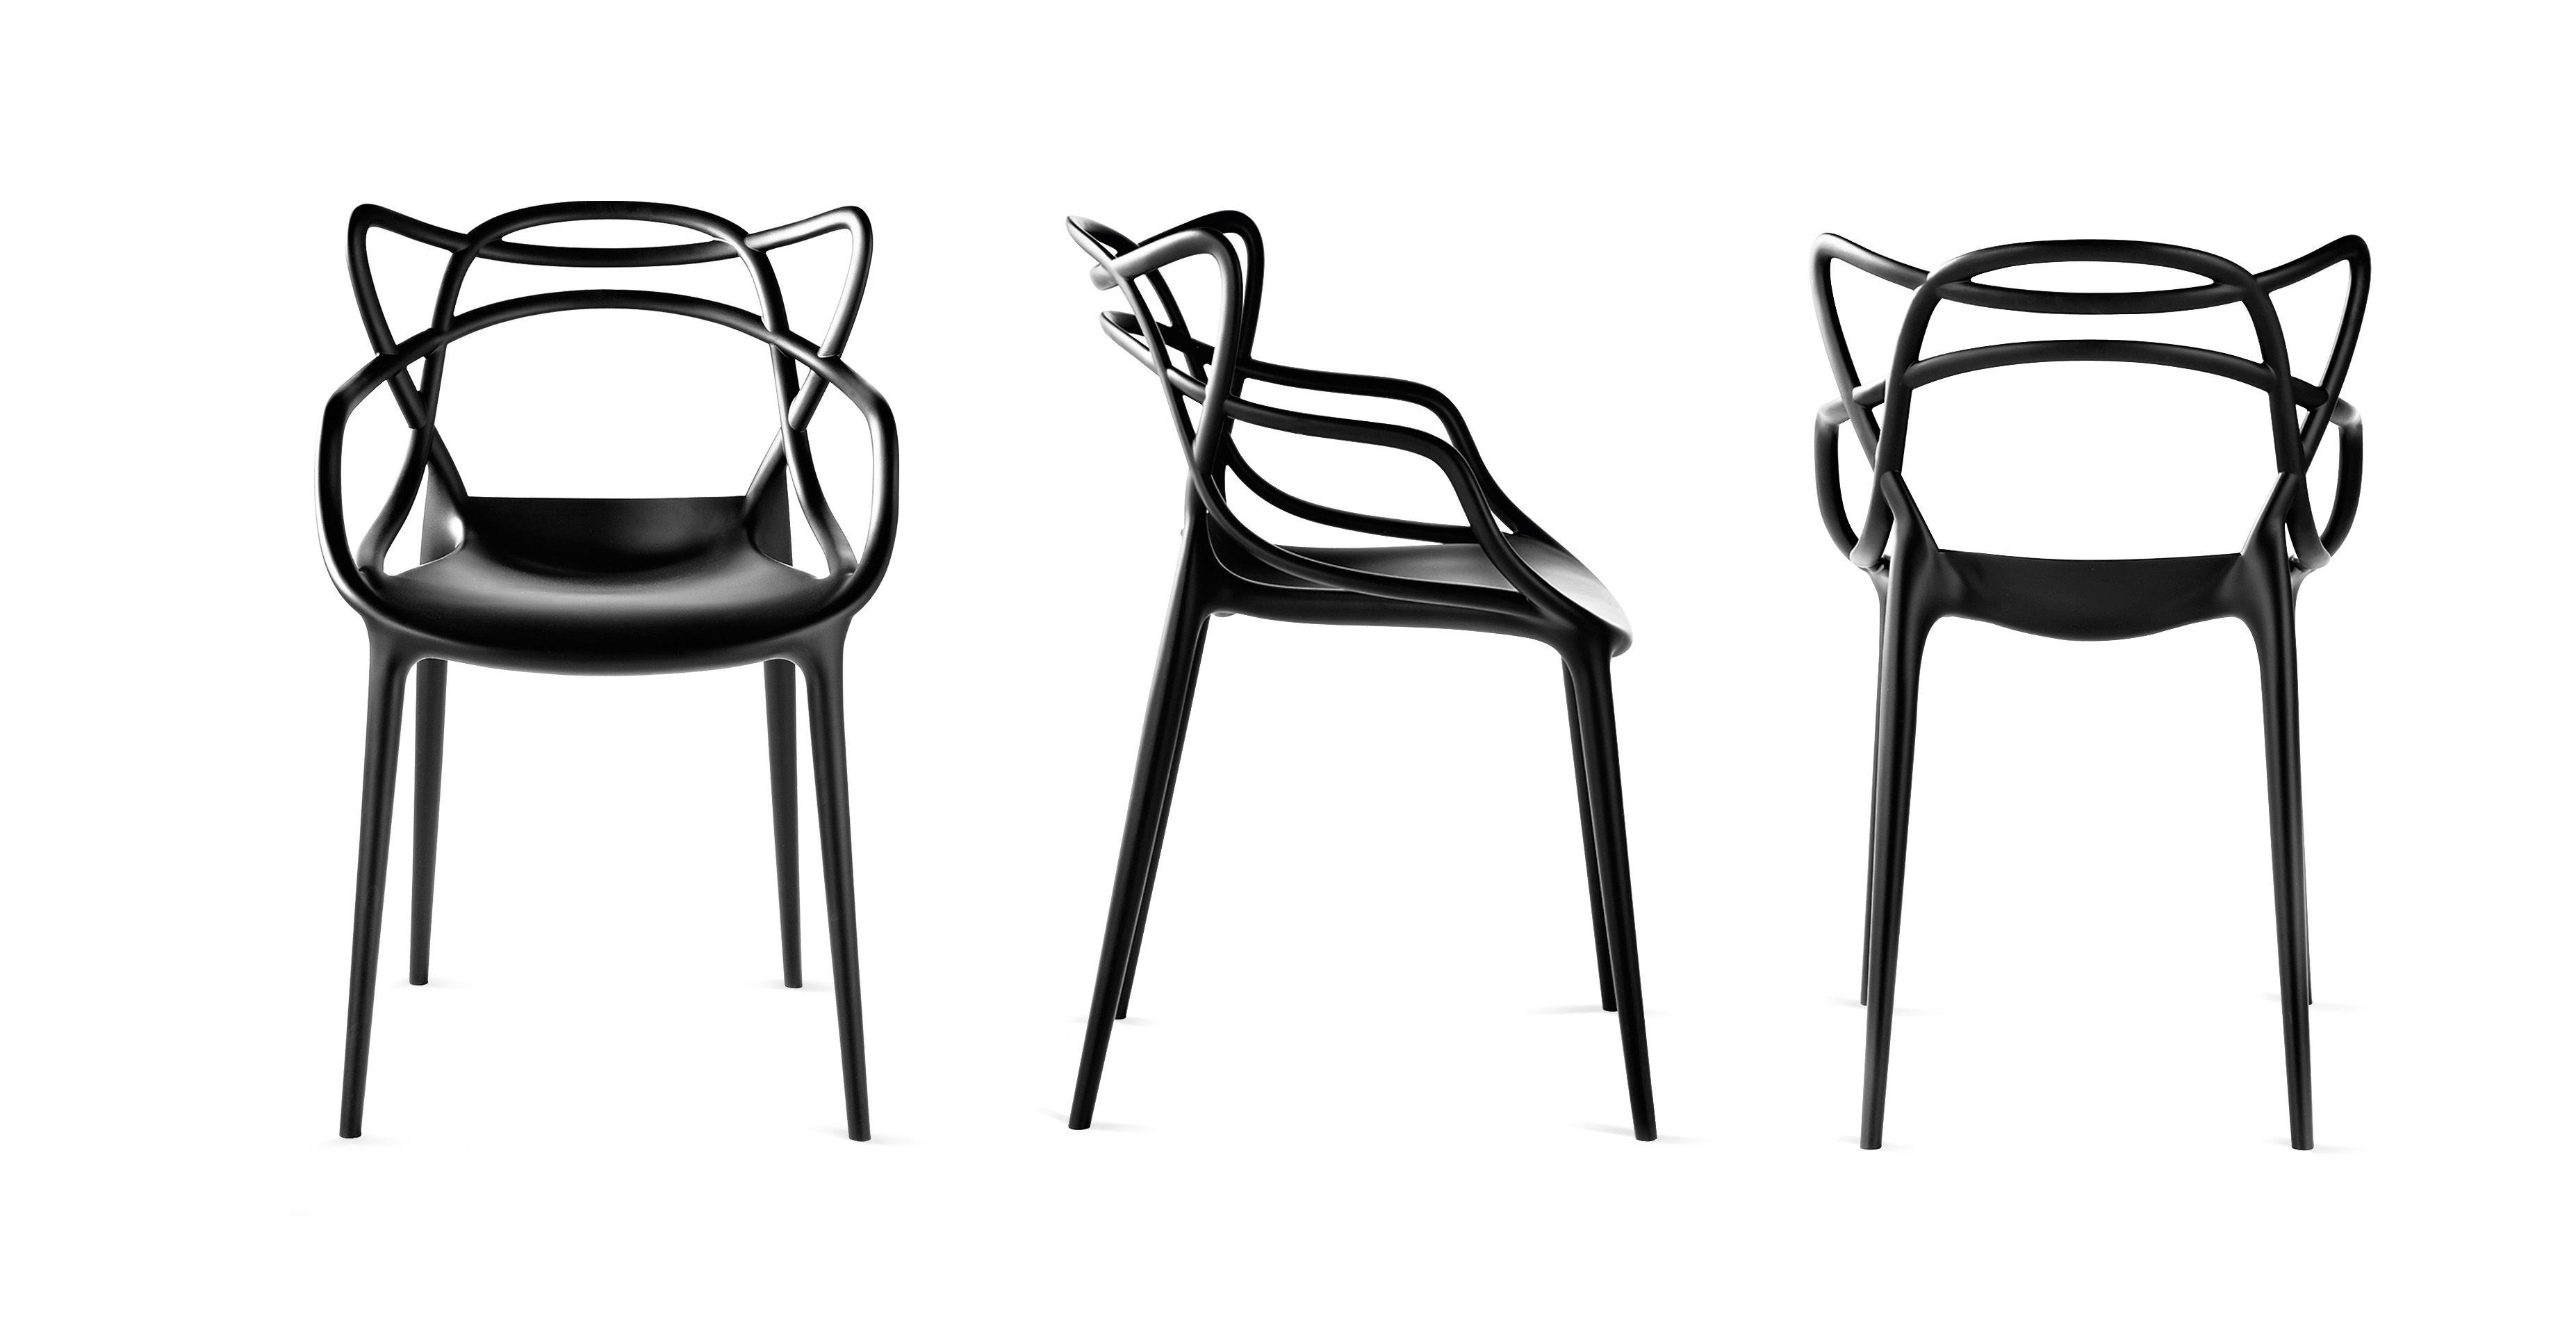 I Portacandele Di Philippe Starck Per Kartell : Scopri poltrona masters mostarda di kartell made in